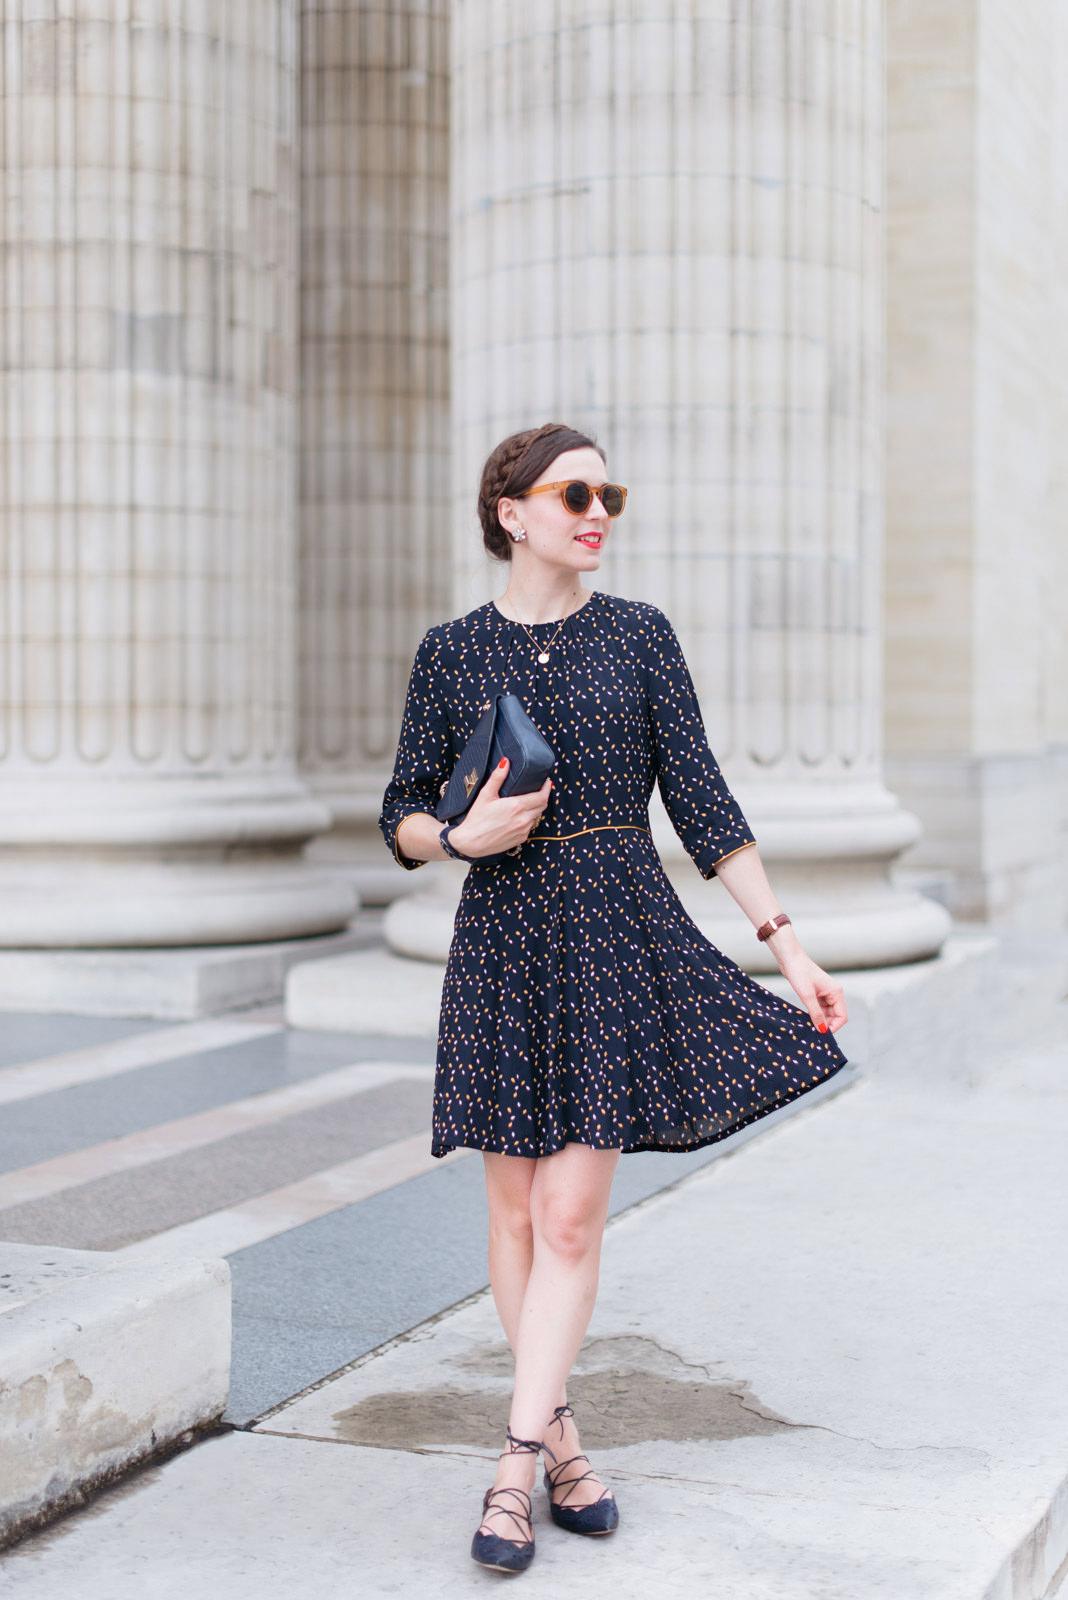 Blog-Mode-And-The-City-Looks-La-Petite-Francaise-3